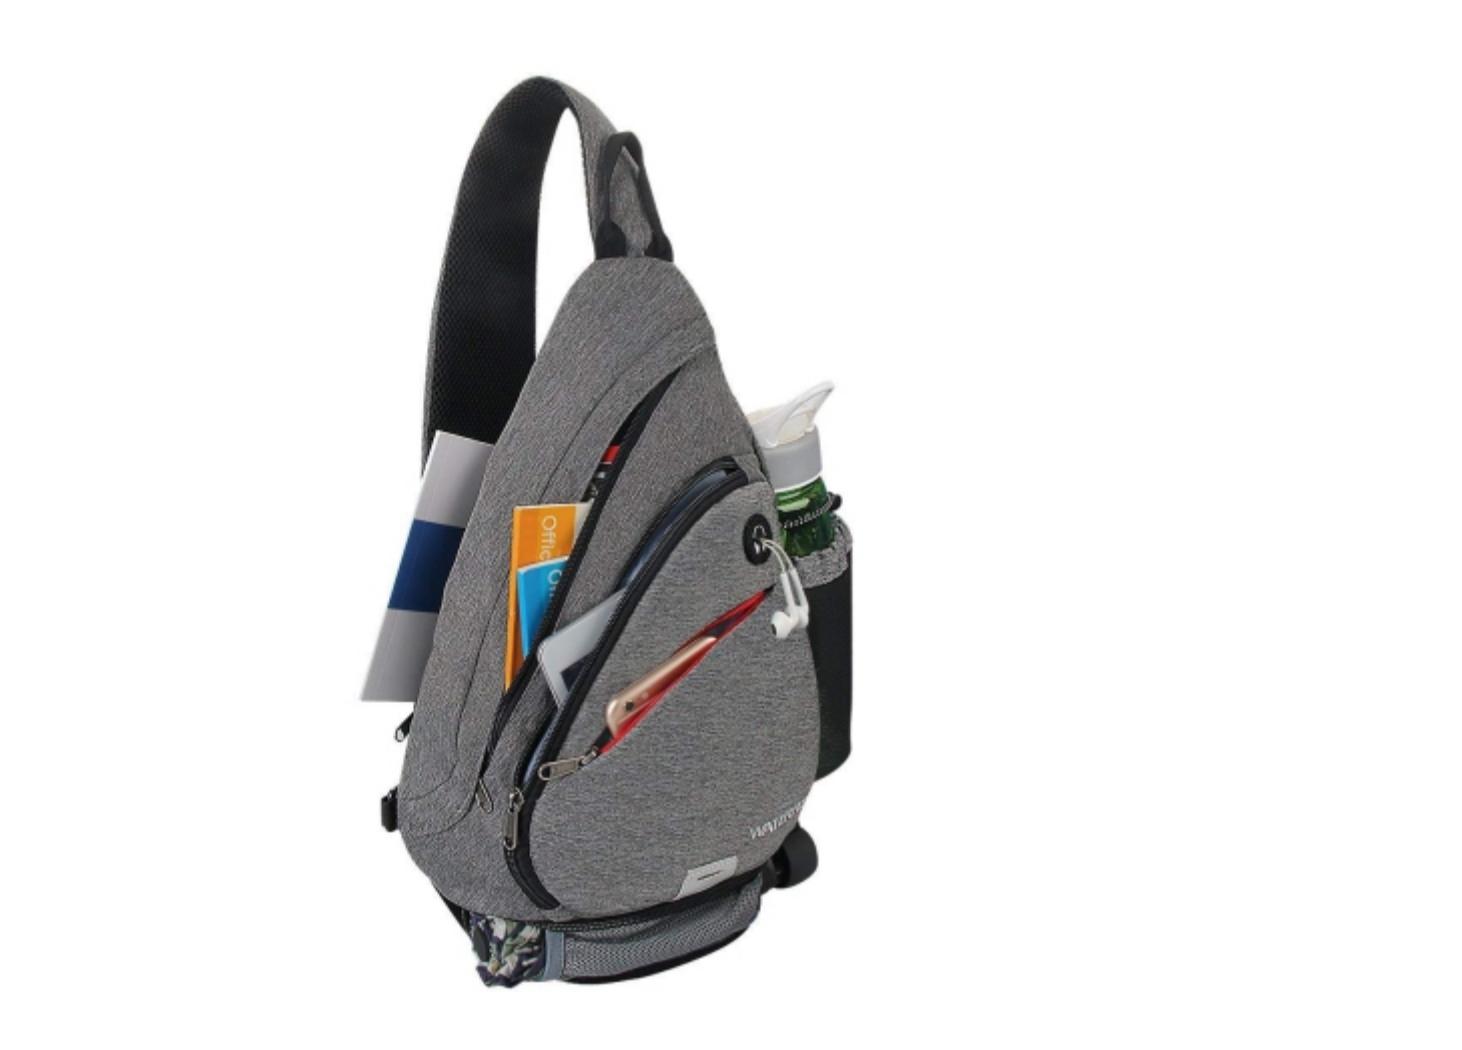 sling backpacks for school and weekends